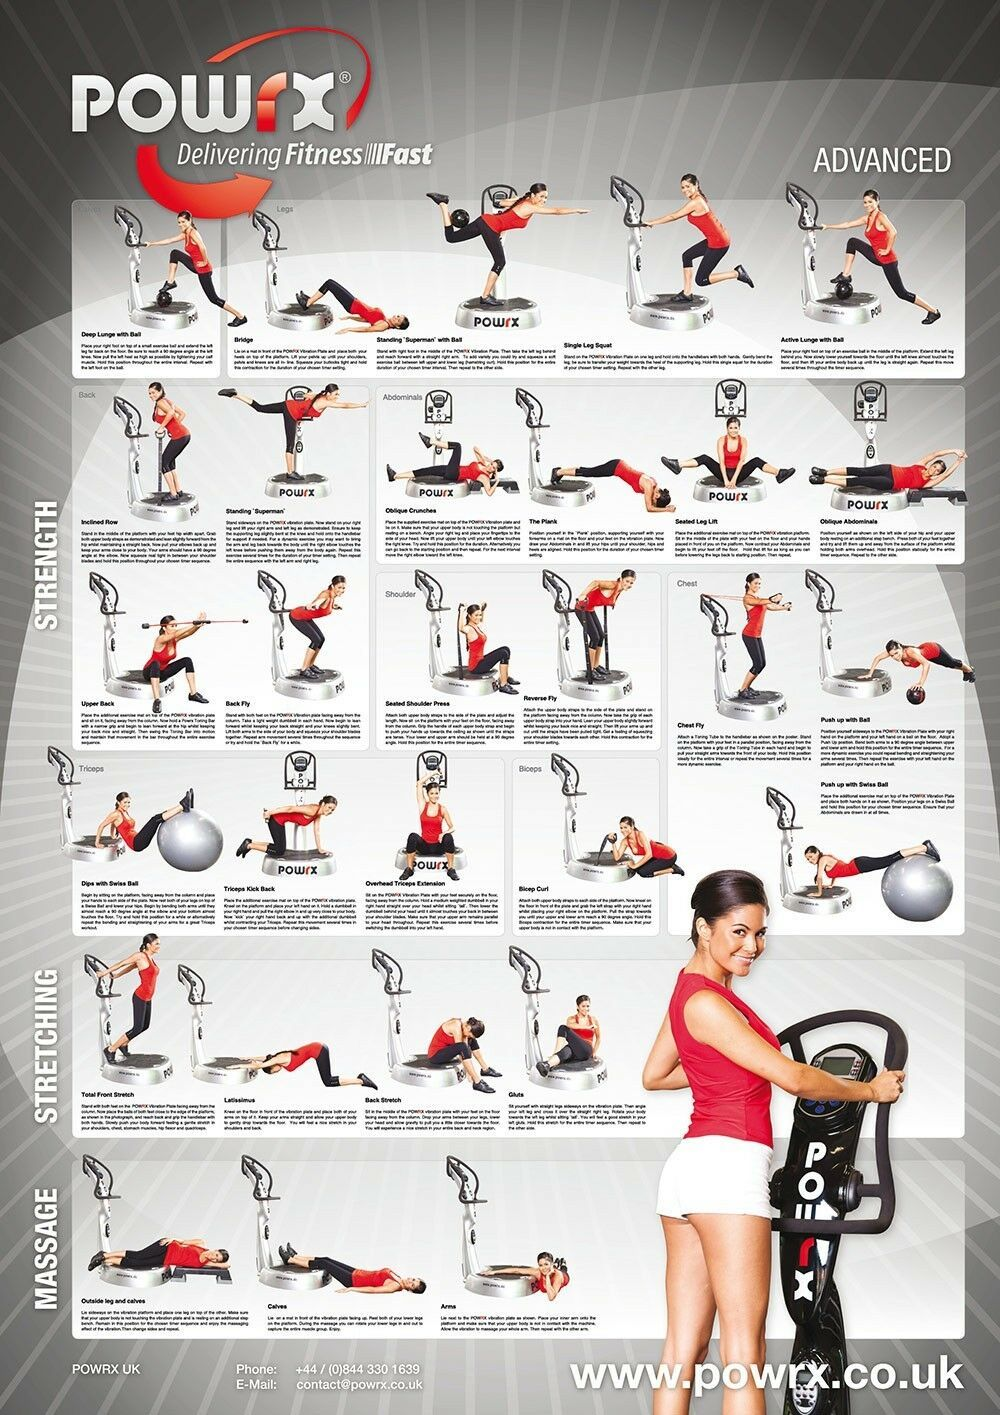 10+ Whole body vibration exercise machine trends